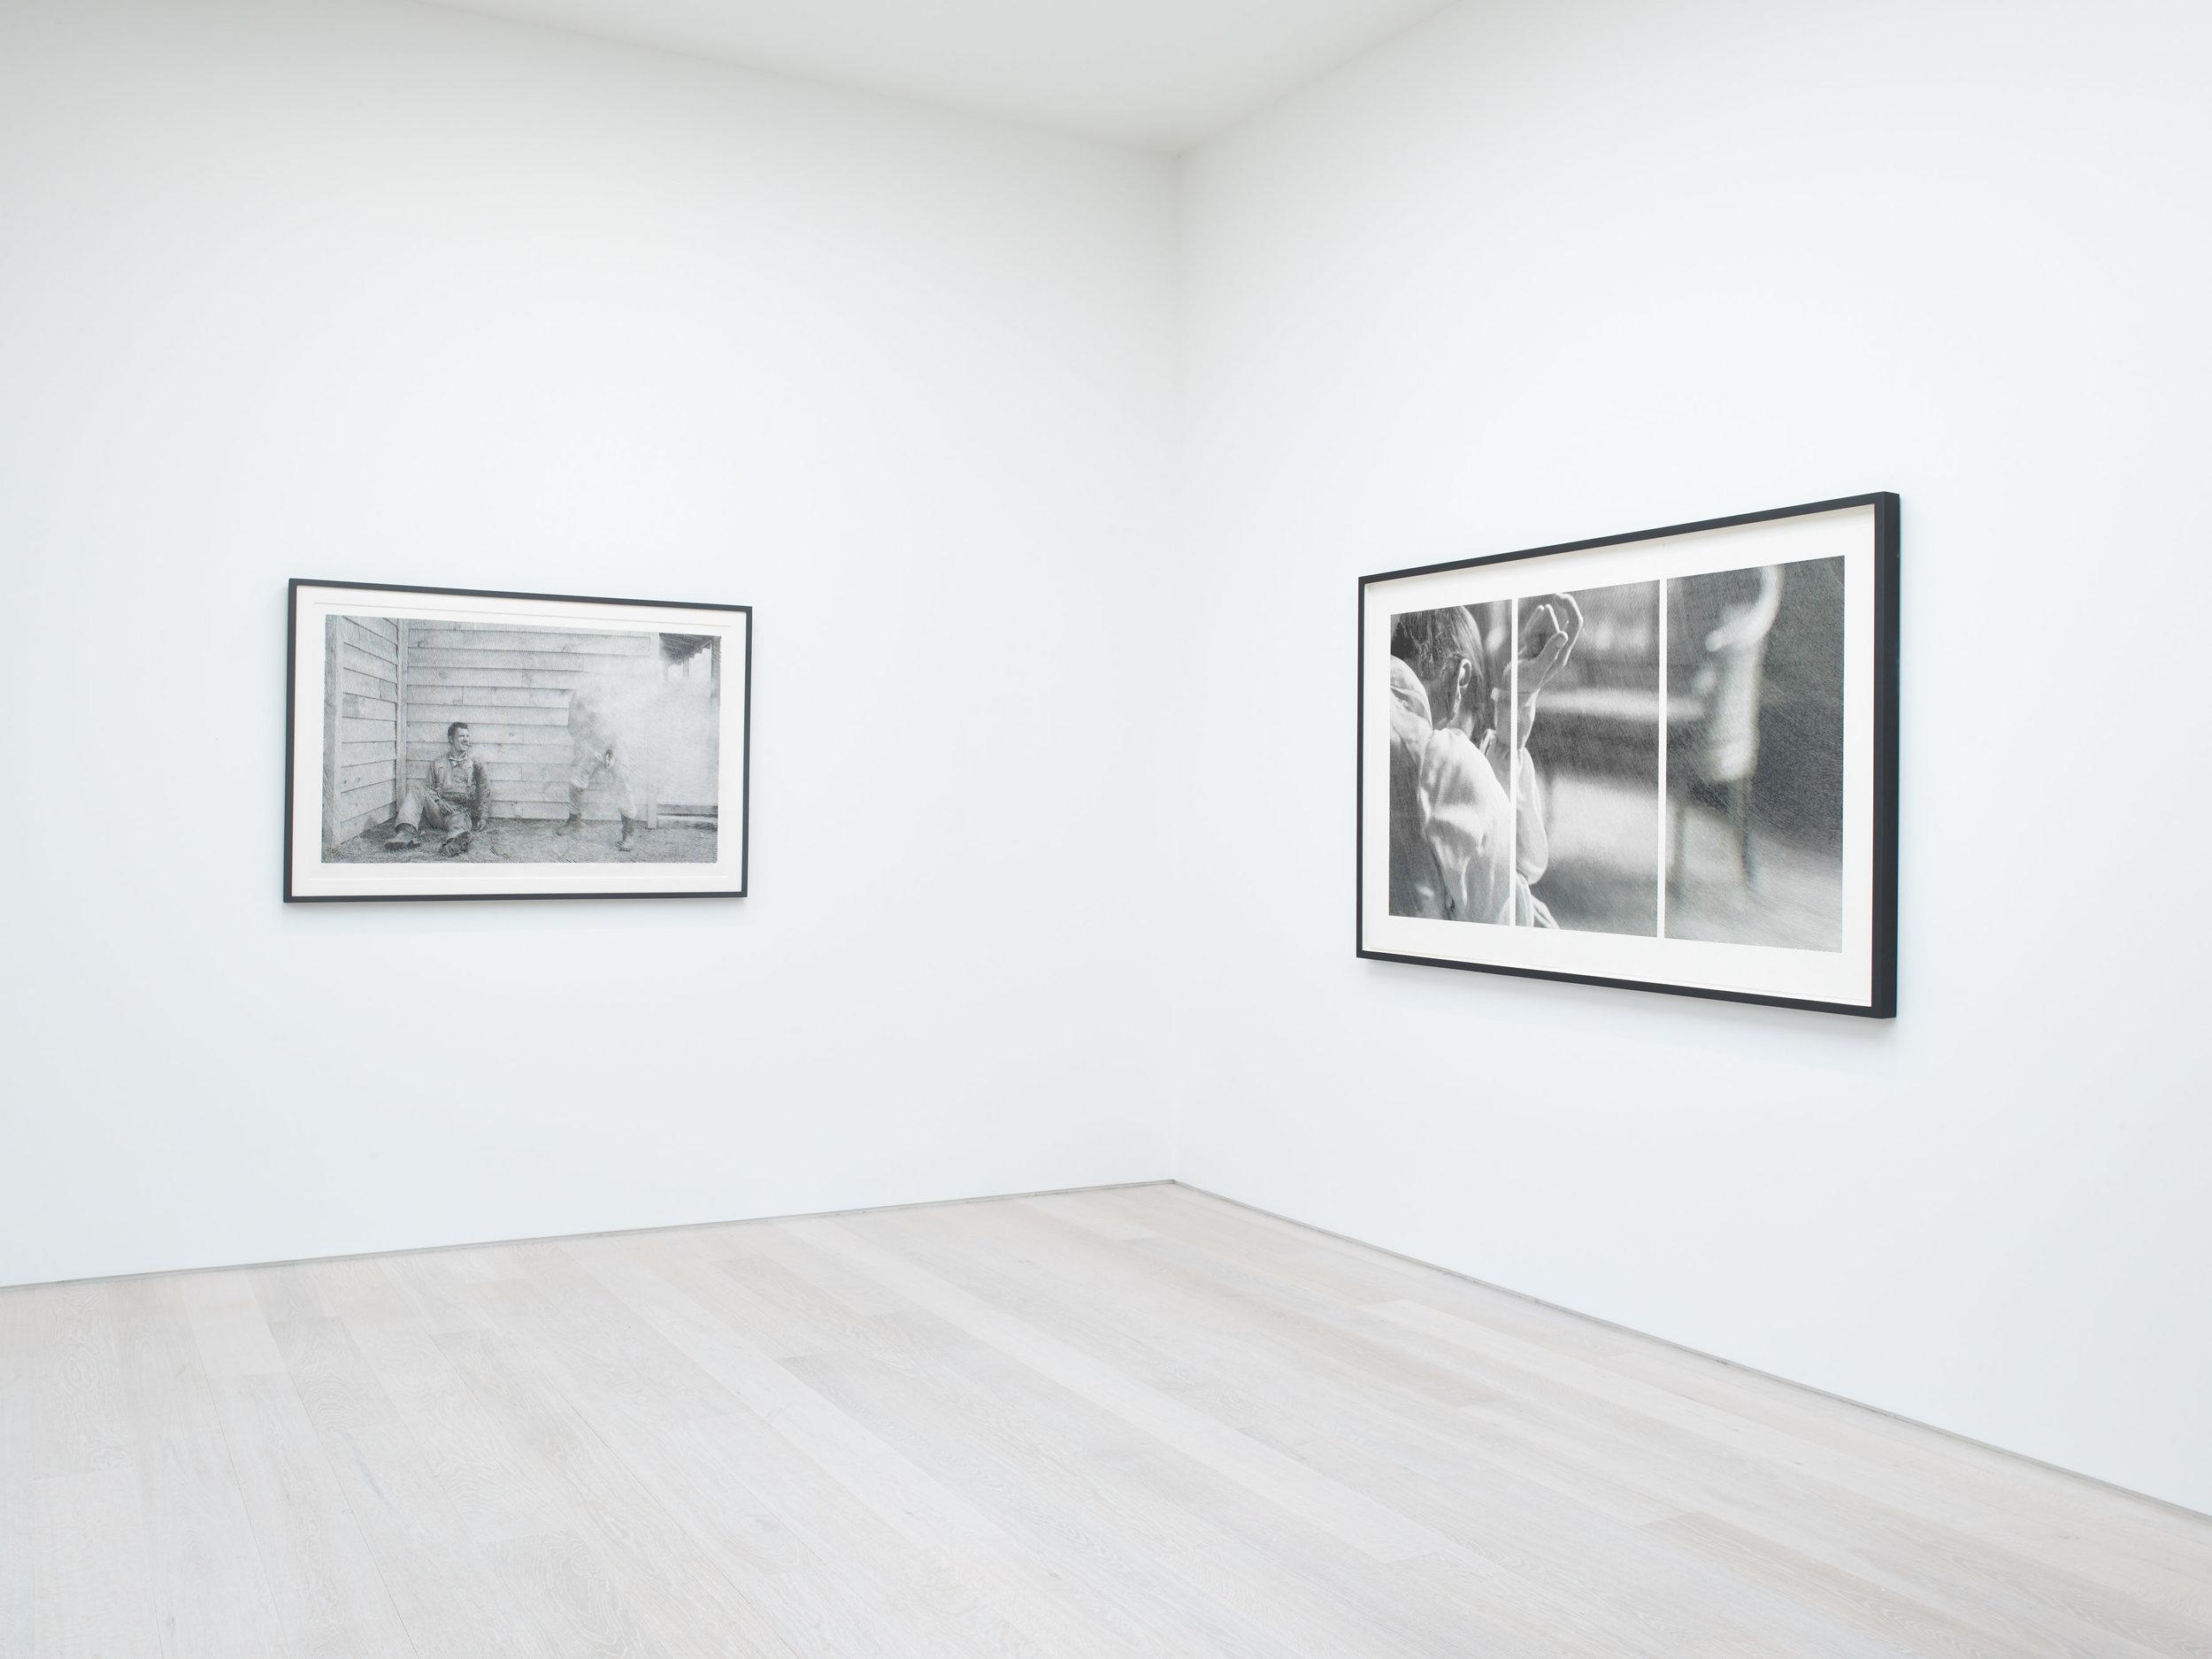 Marie Harnett_Still_Alan Cristea Gallery 2017 installation. Photo Stephe...-7.jpg